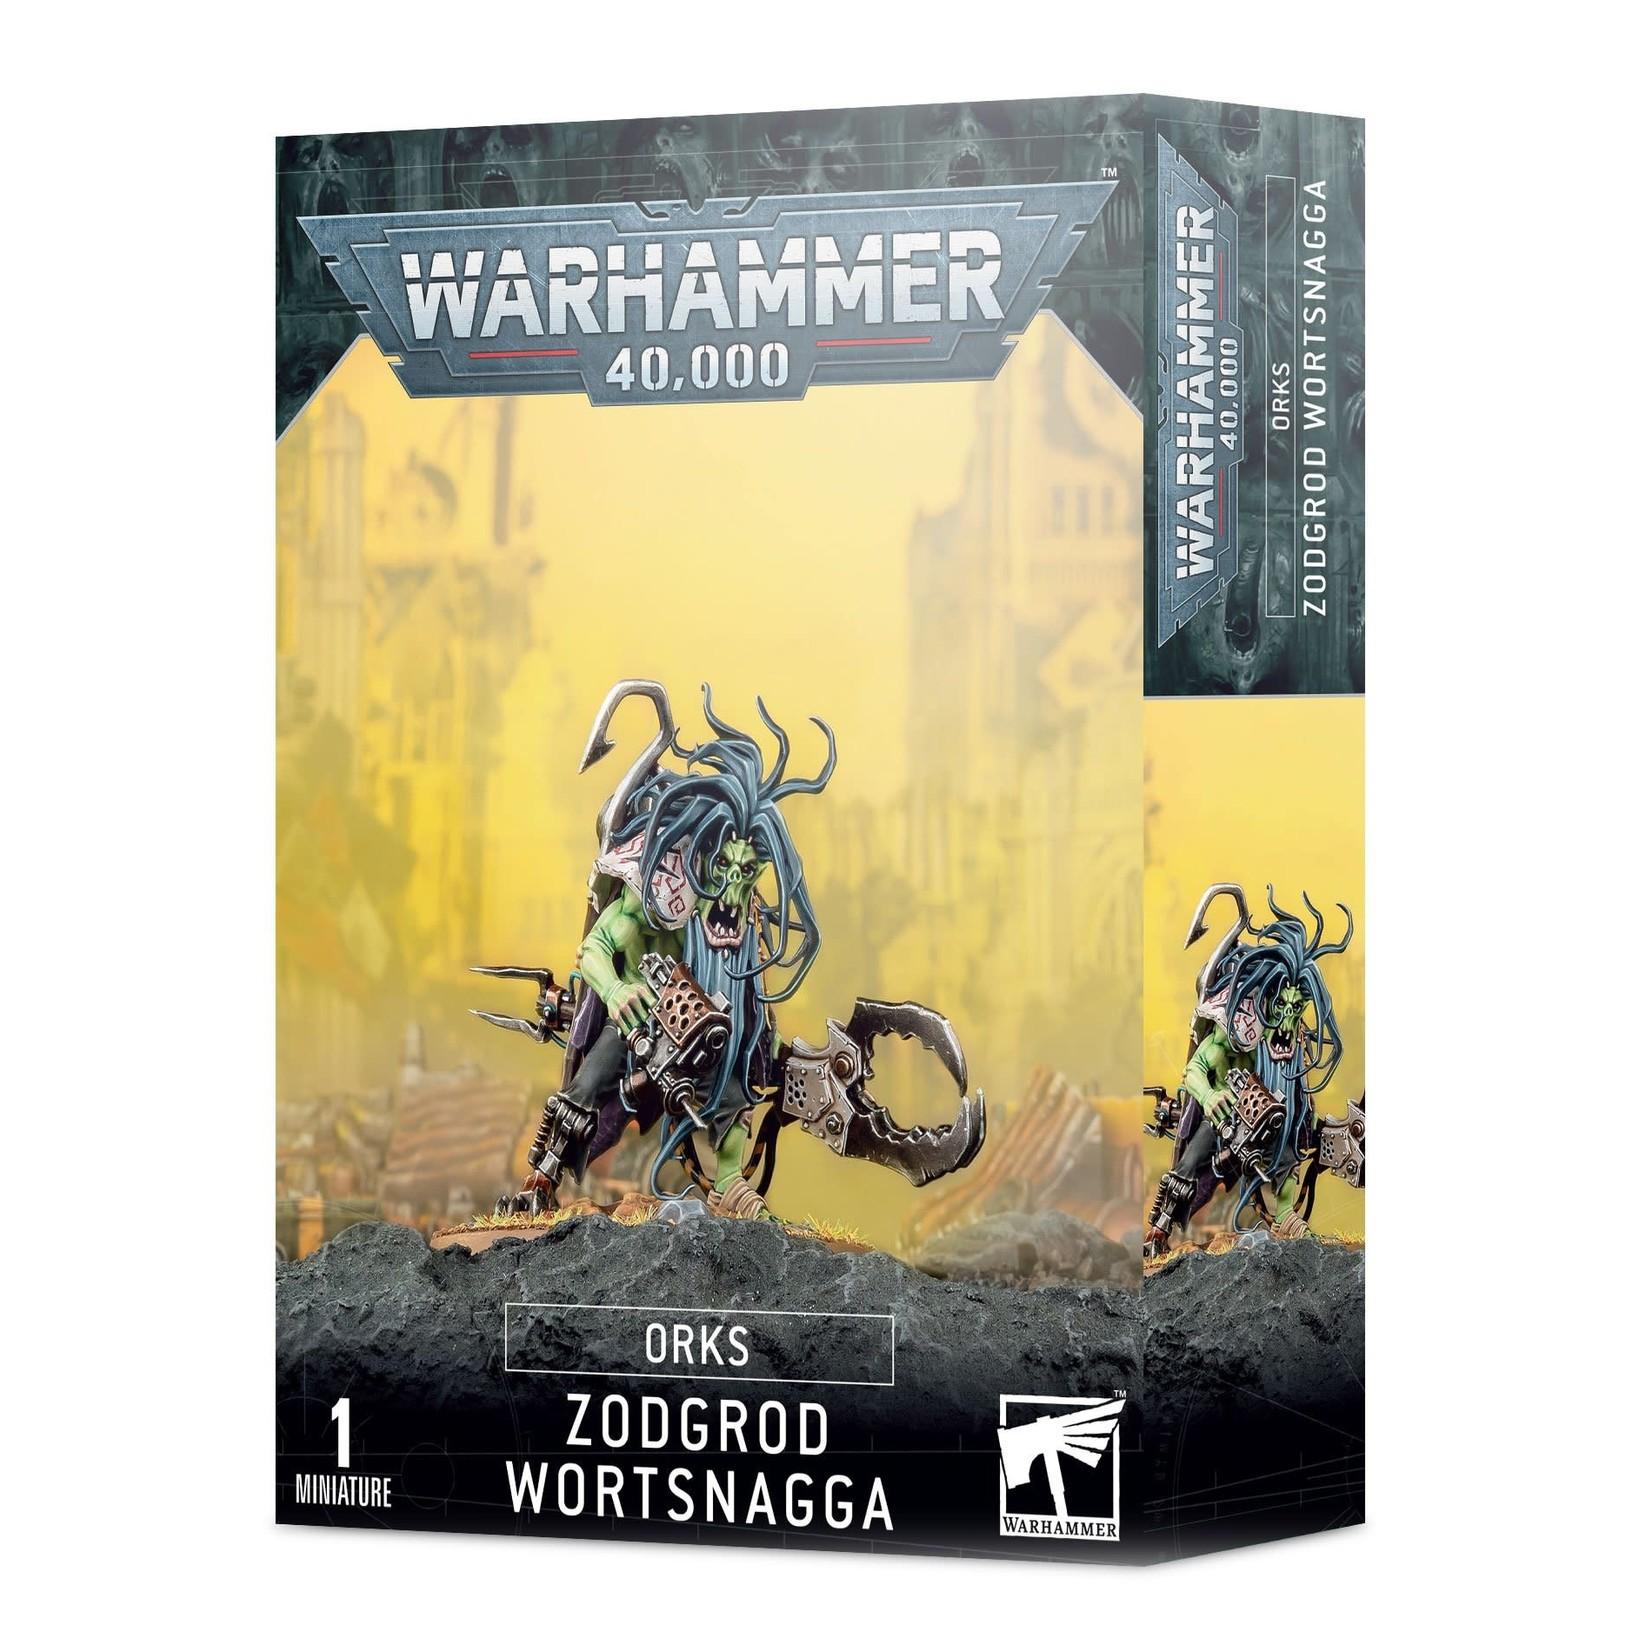 Games Workshop Warhammer 40k: Orks - Zodgrod Wortsnagga